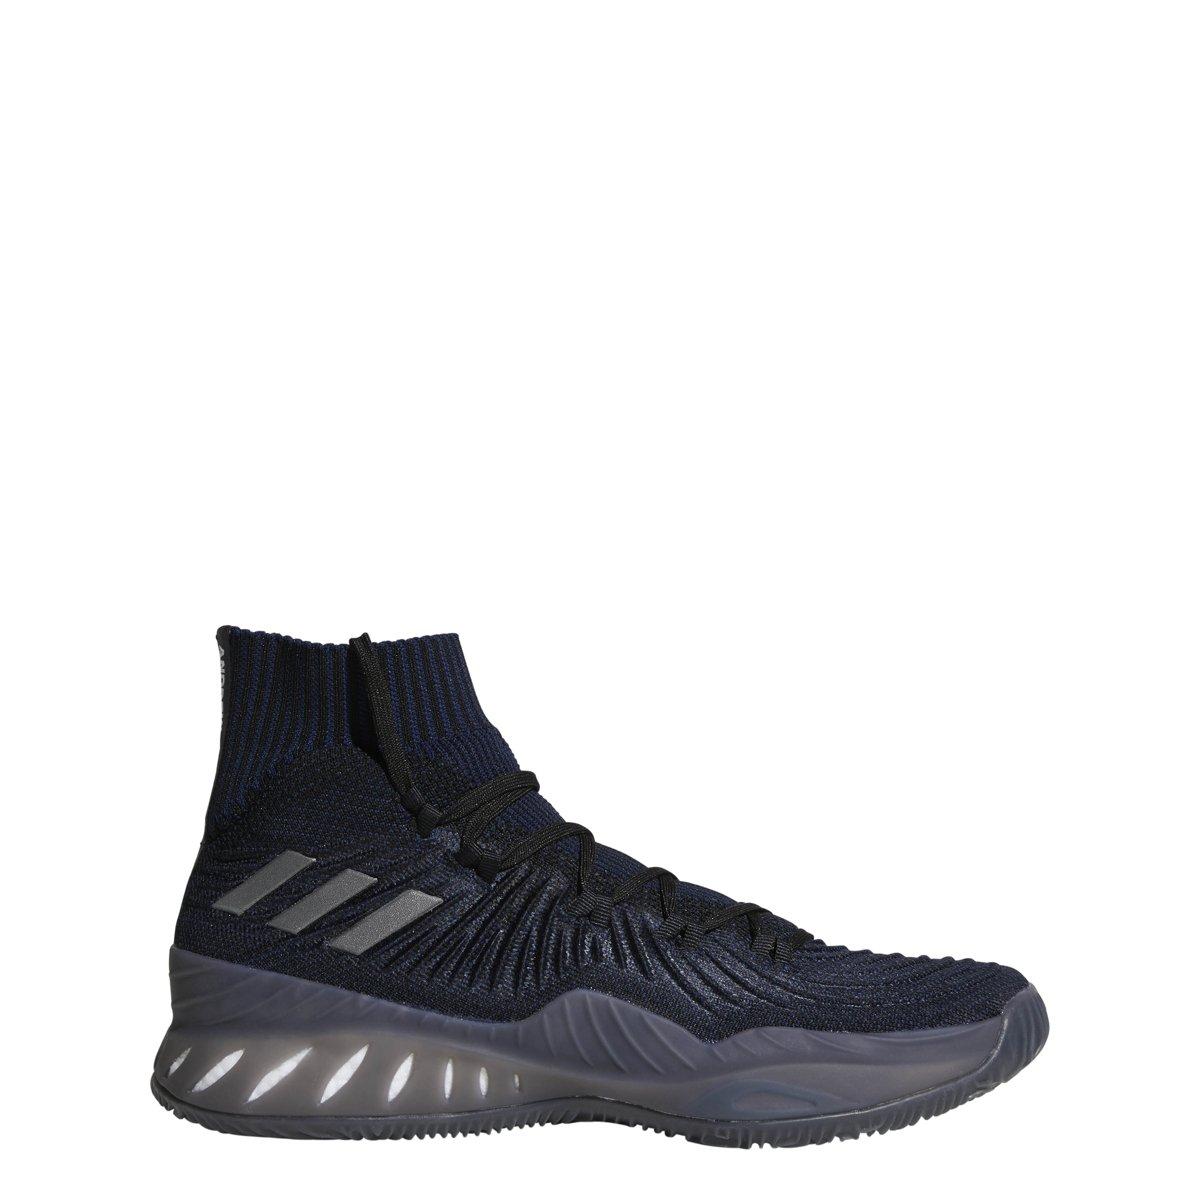 adidas scarpe da uomo pazzo esplosivo 2017 primeknit basket